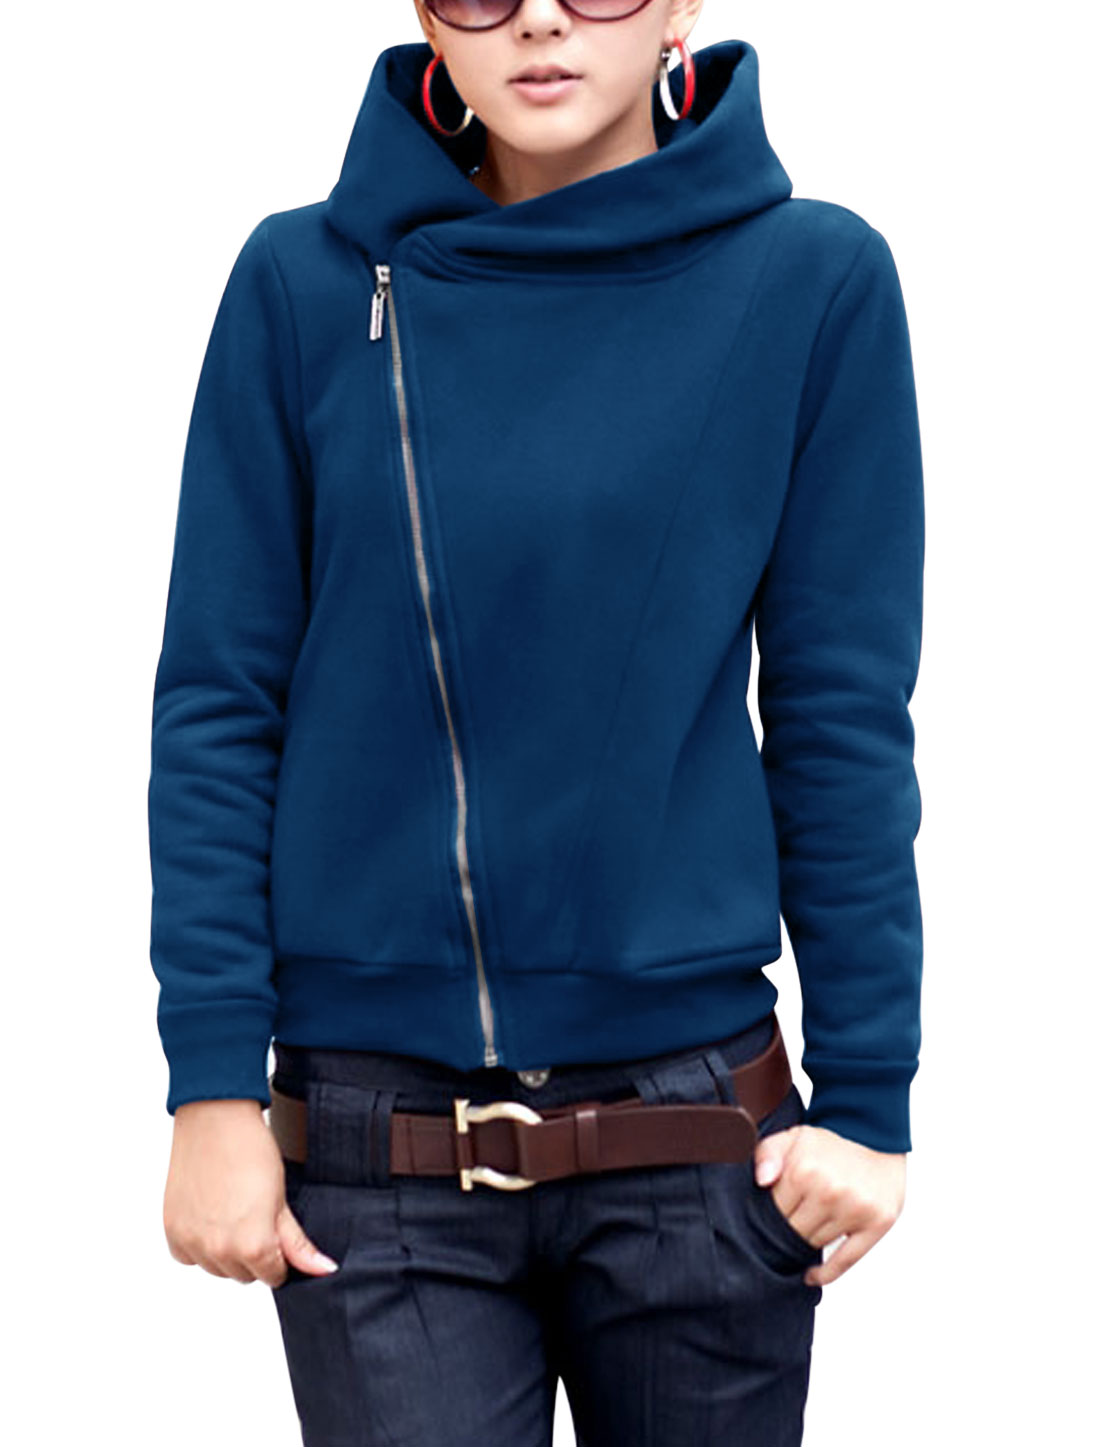 Lady Double Side Pockets Long Sleeve Stylish Sweatshirt Dark Blue S